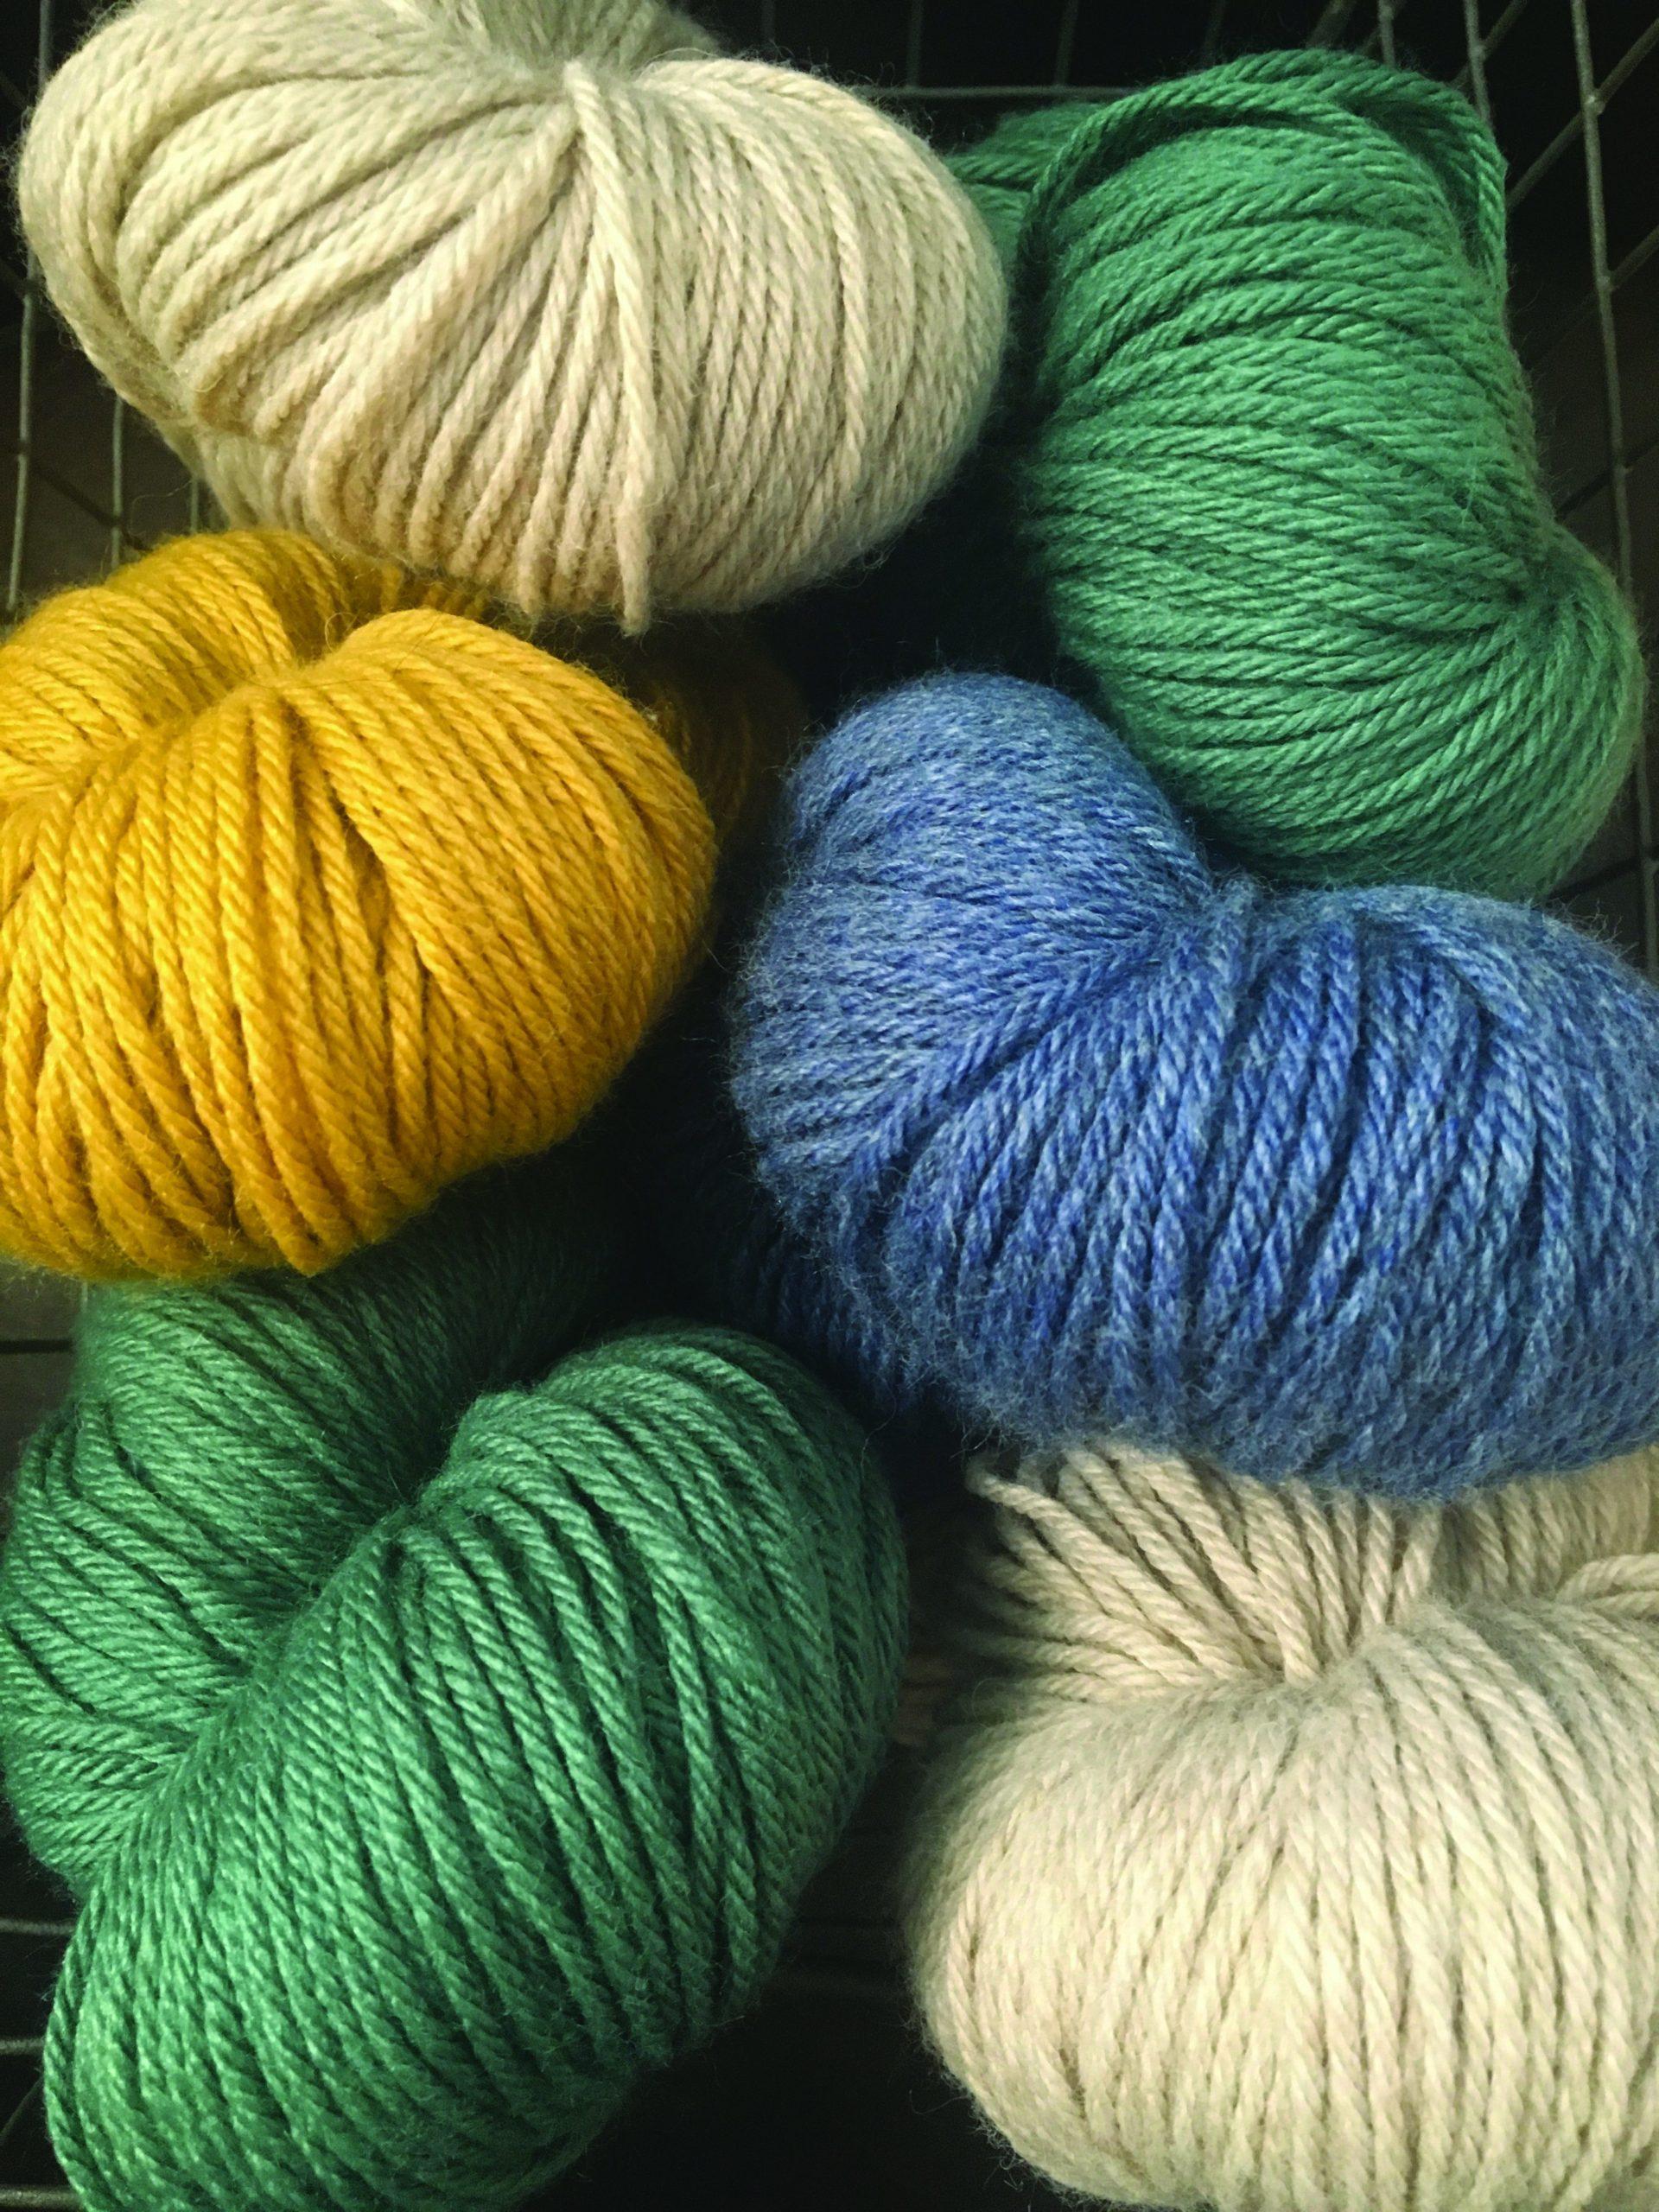 ATELIER tricot sarah vombrack VtEhG6WCi0Y unsplash compressed